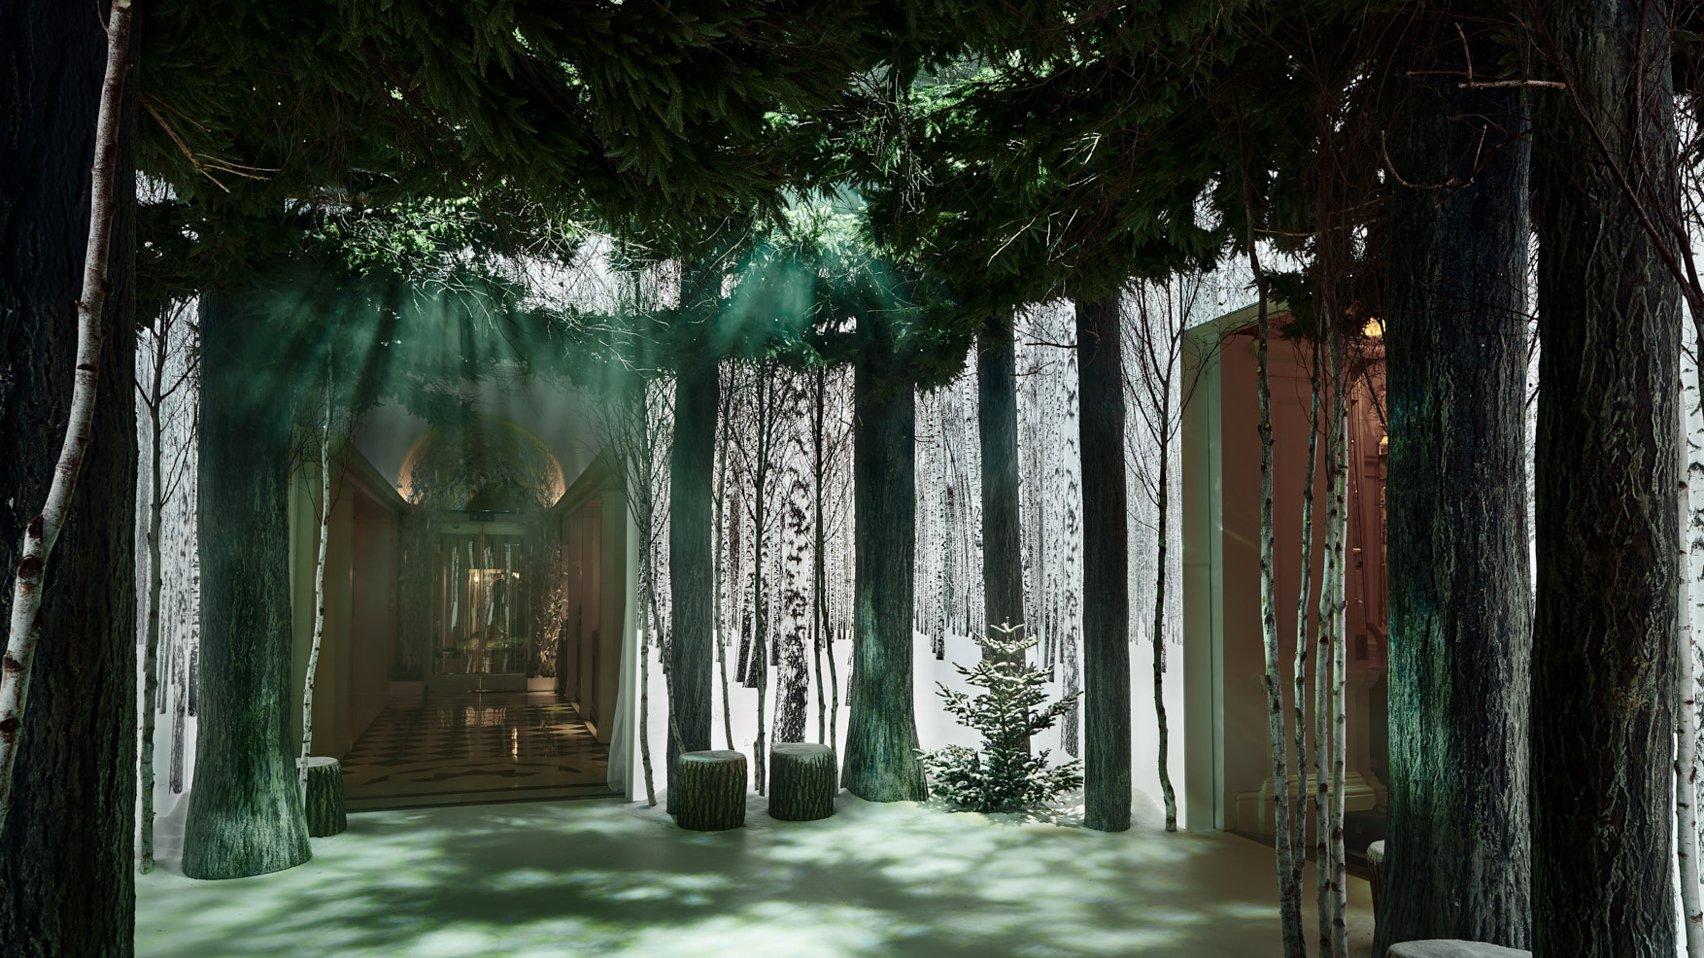 jony-ive-marc-newson-christmas-tree-design-claridges-london_dezeen_1704_hero